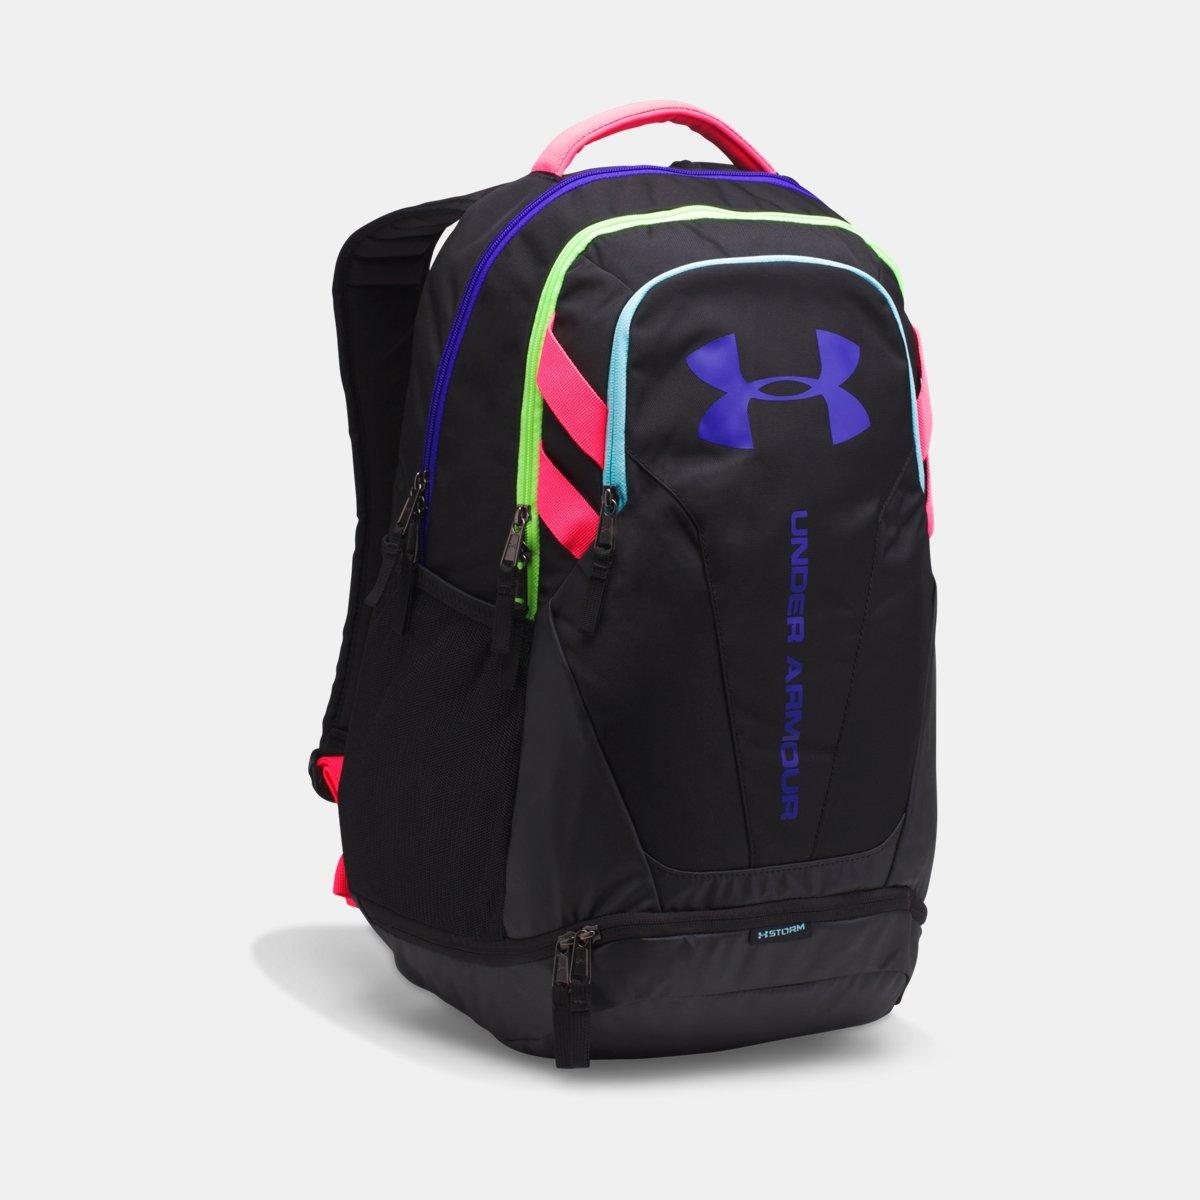 [UNDER ARMOUR] アンダーアーマー Men's UA Hustle 3.0 Backpack Black /Black [並行輸入品] B0753C1GML